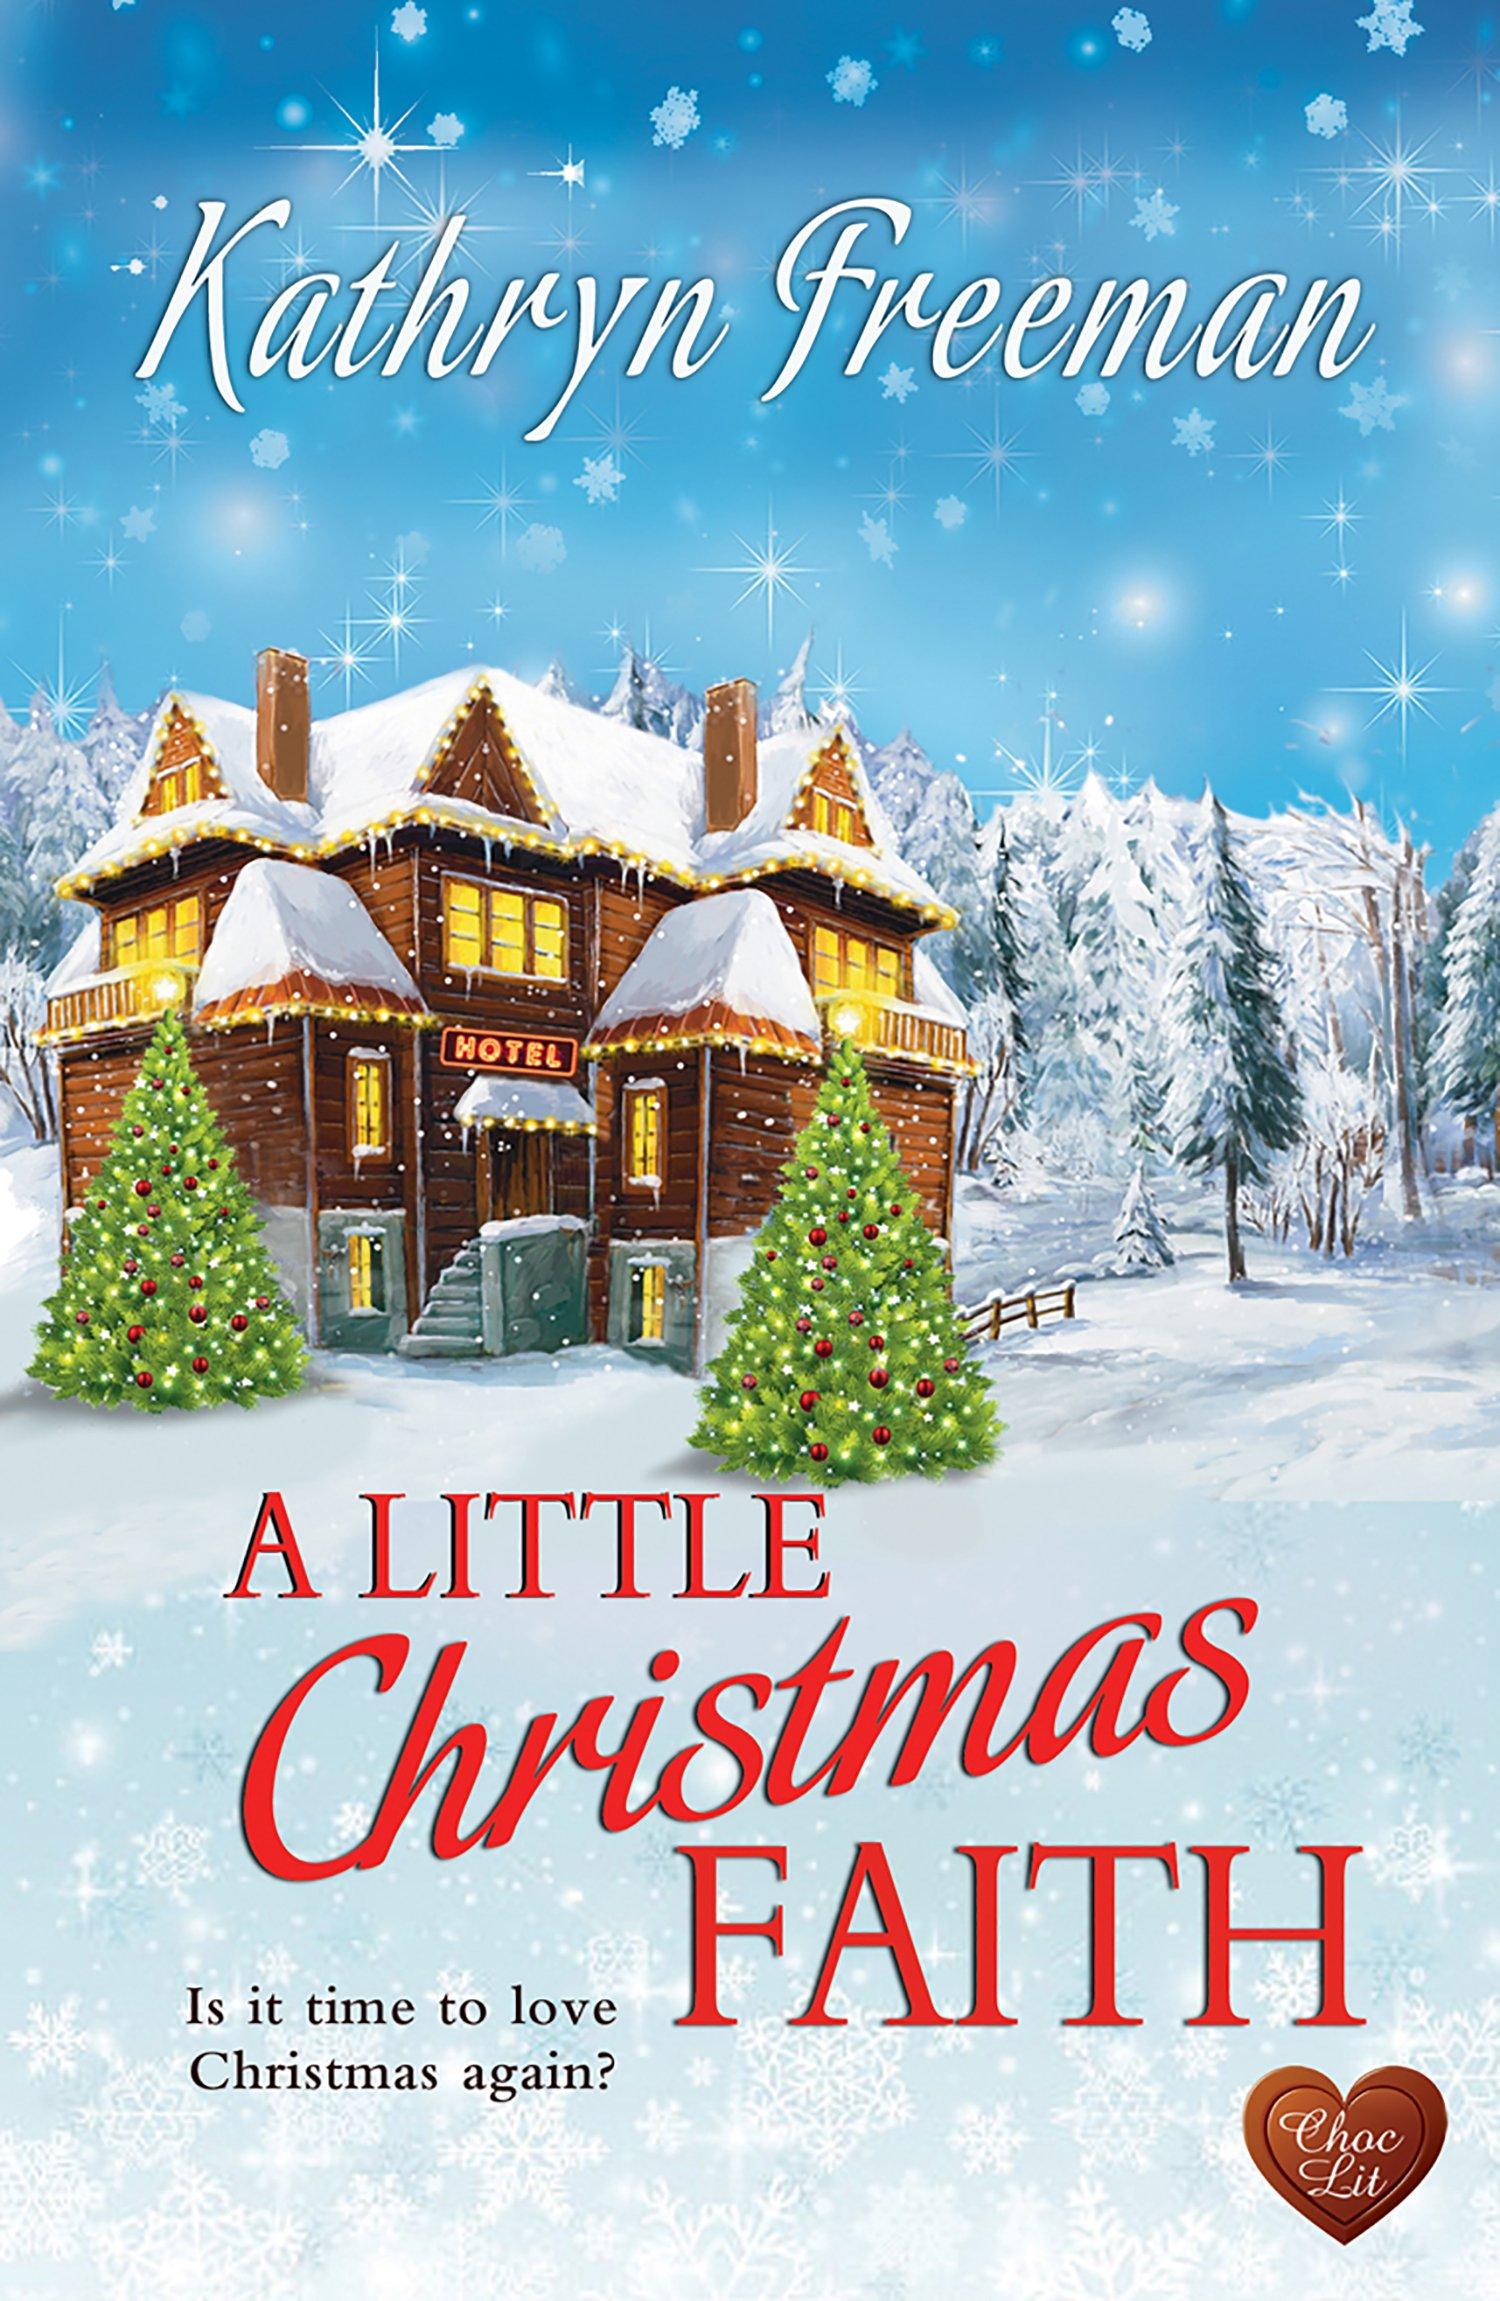 When Is Little Christmas.A Little Christmas Faith Amazon Co Uk Kathryn Freeman